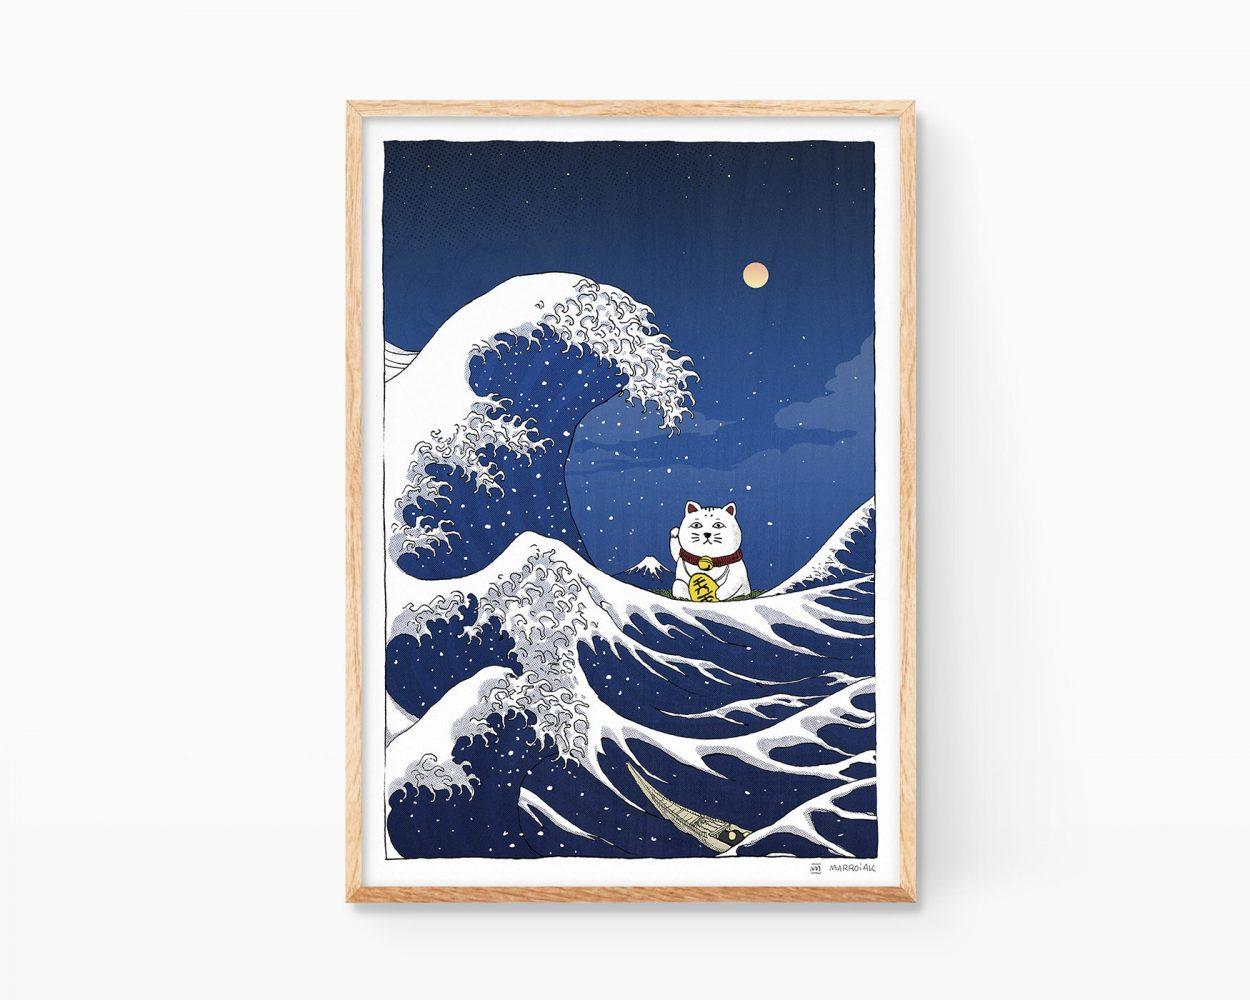 Illustration art mashup: The lucky cat vs the great wave off kanagawa (Night Remix). Japanese pop art drawing versions